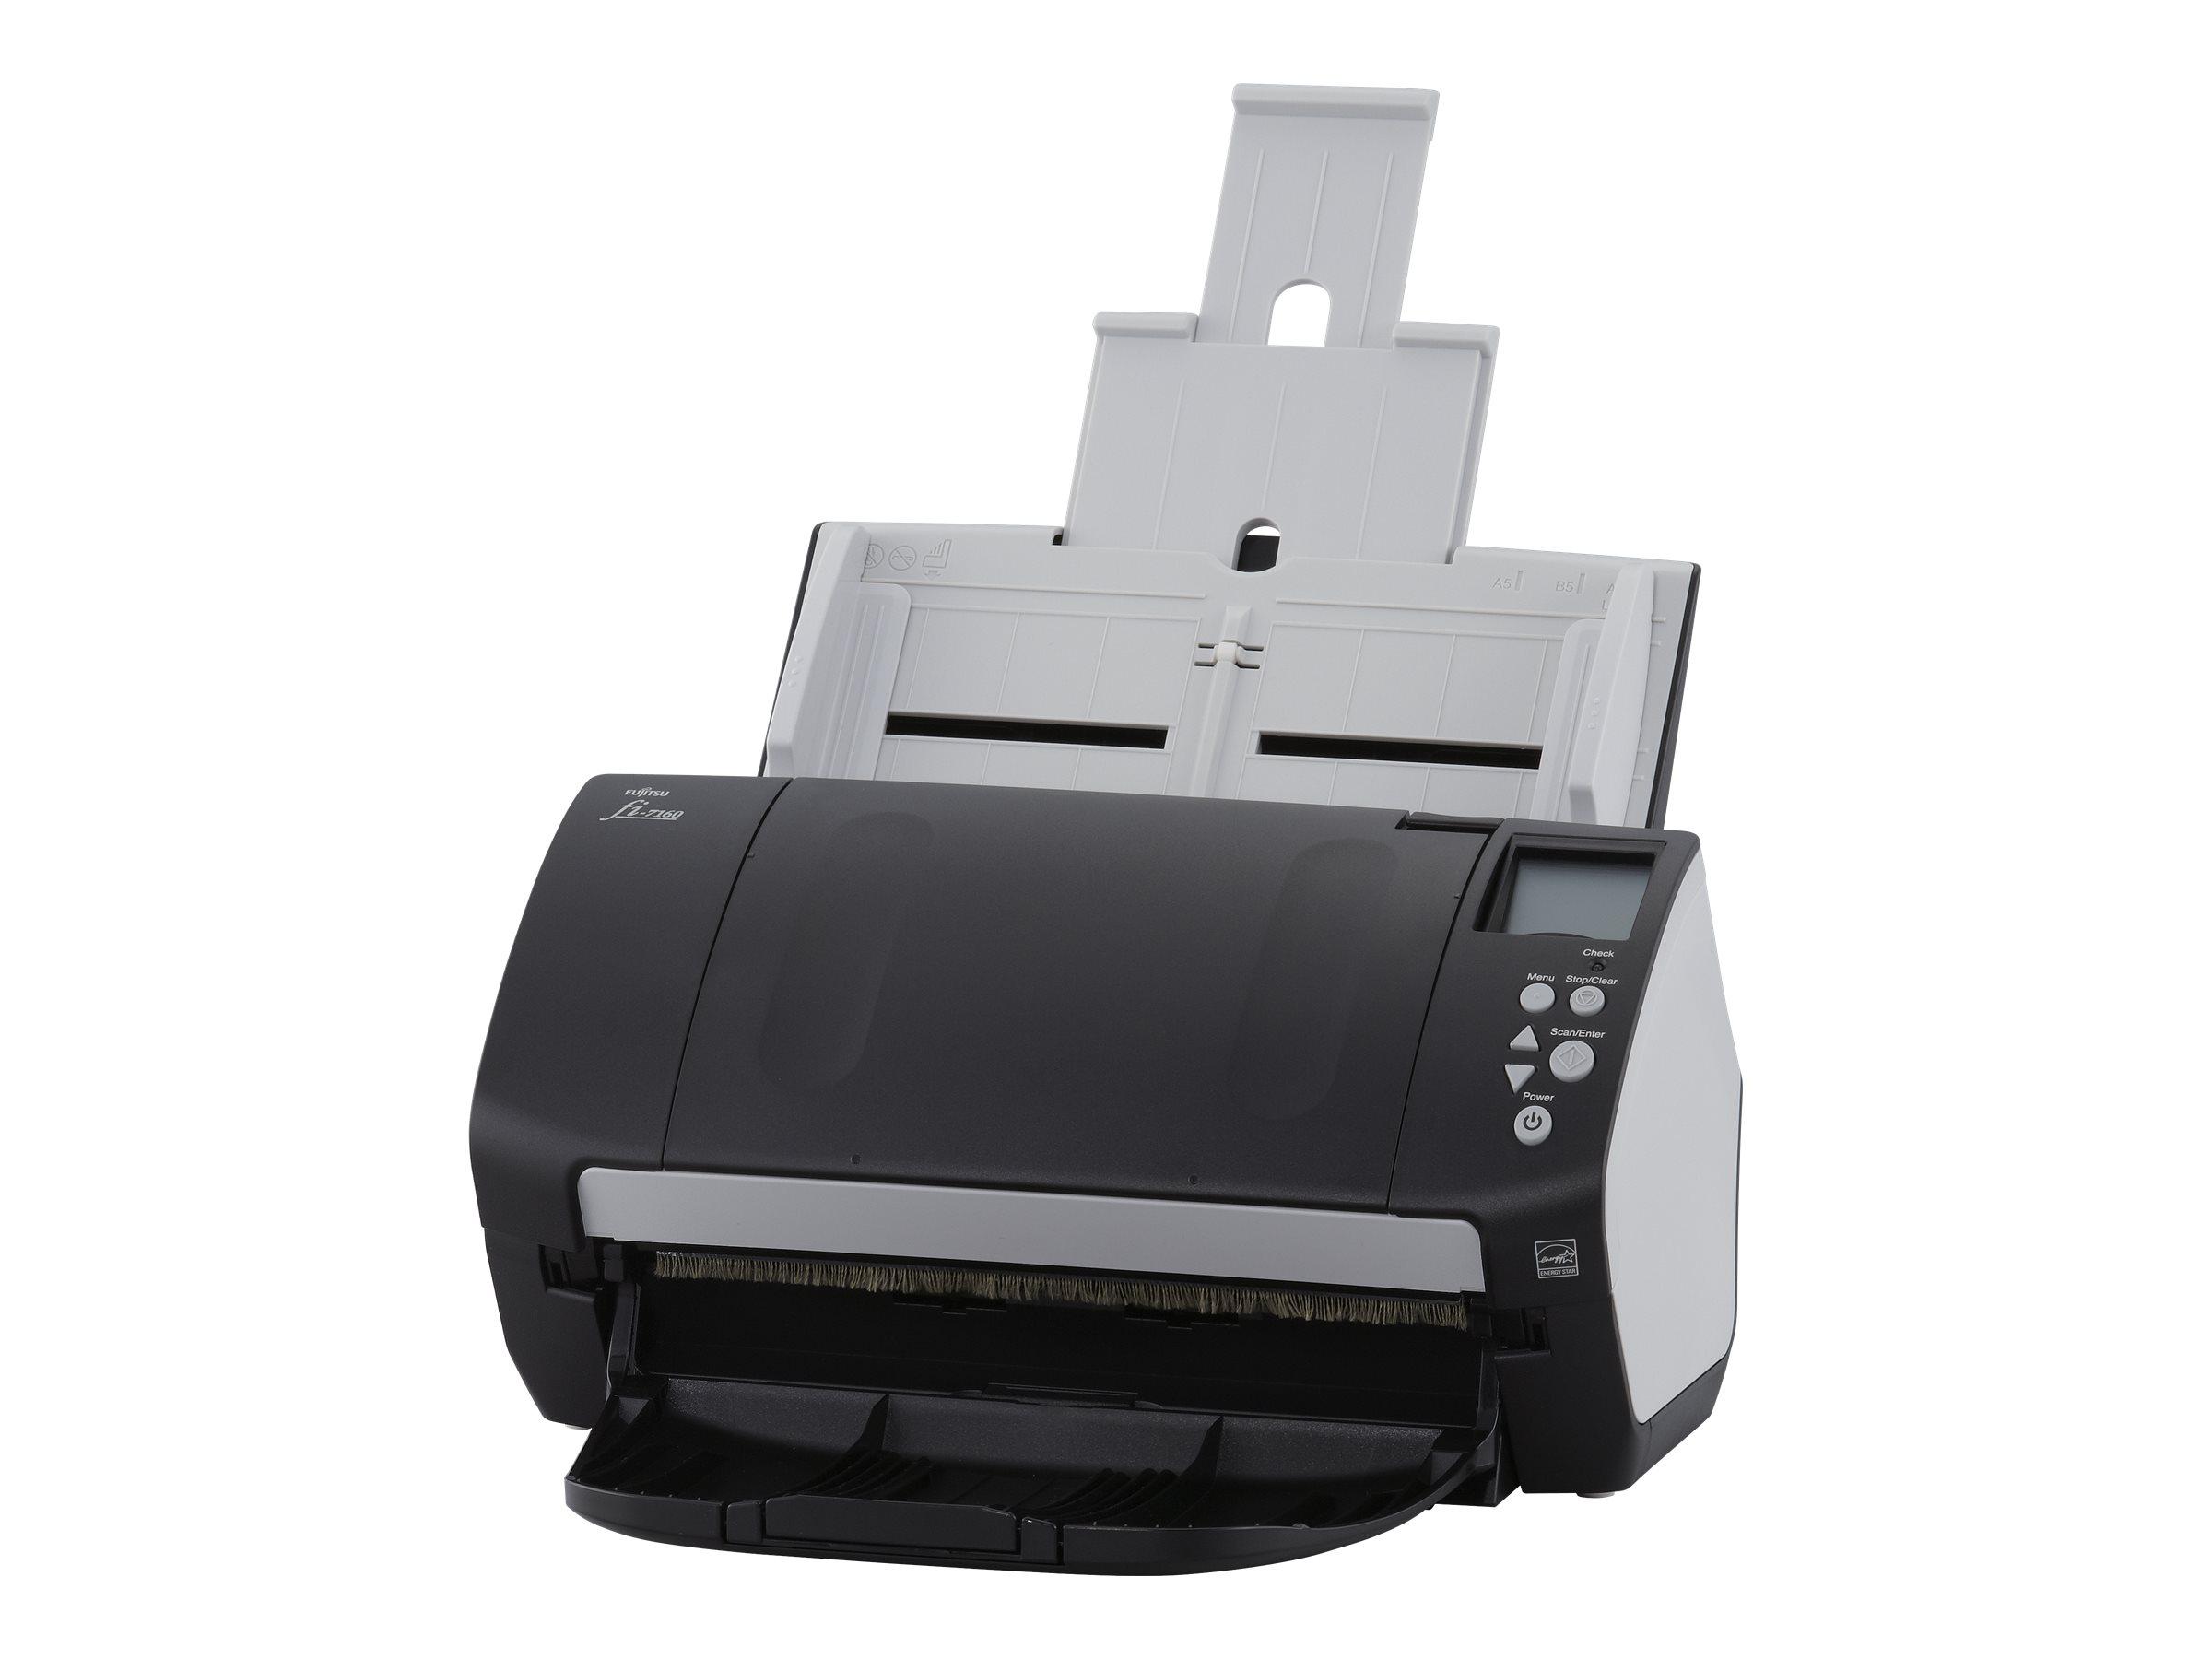 Fujitsu fi-7160 - Dokumentenscanner - Dual CCD - Duplex - 216 x 355.6 mm - 600 dpi x 600 dpi - bis zu 60 Seiten/Min. (einfarbig)